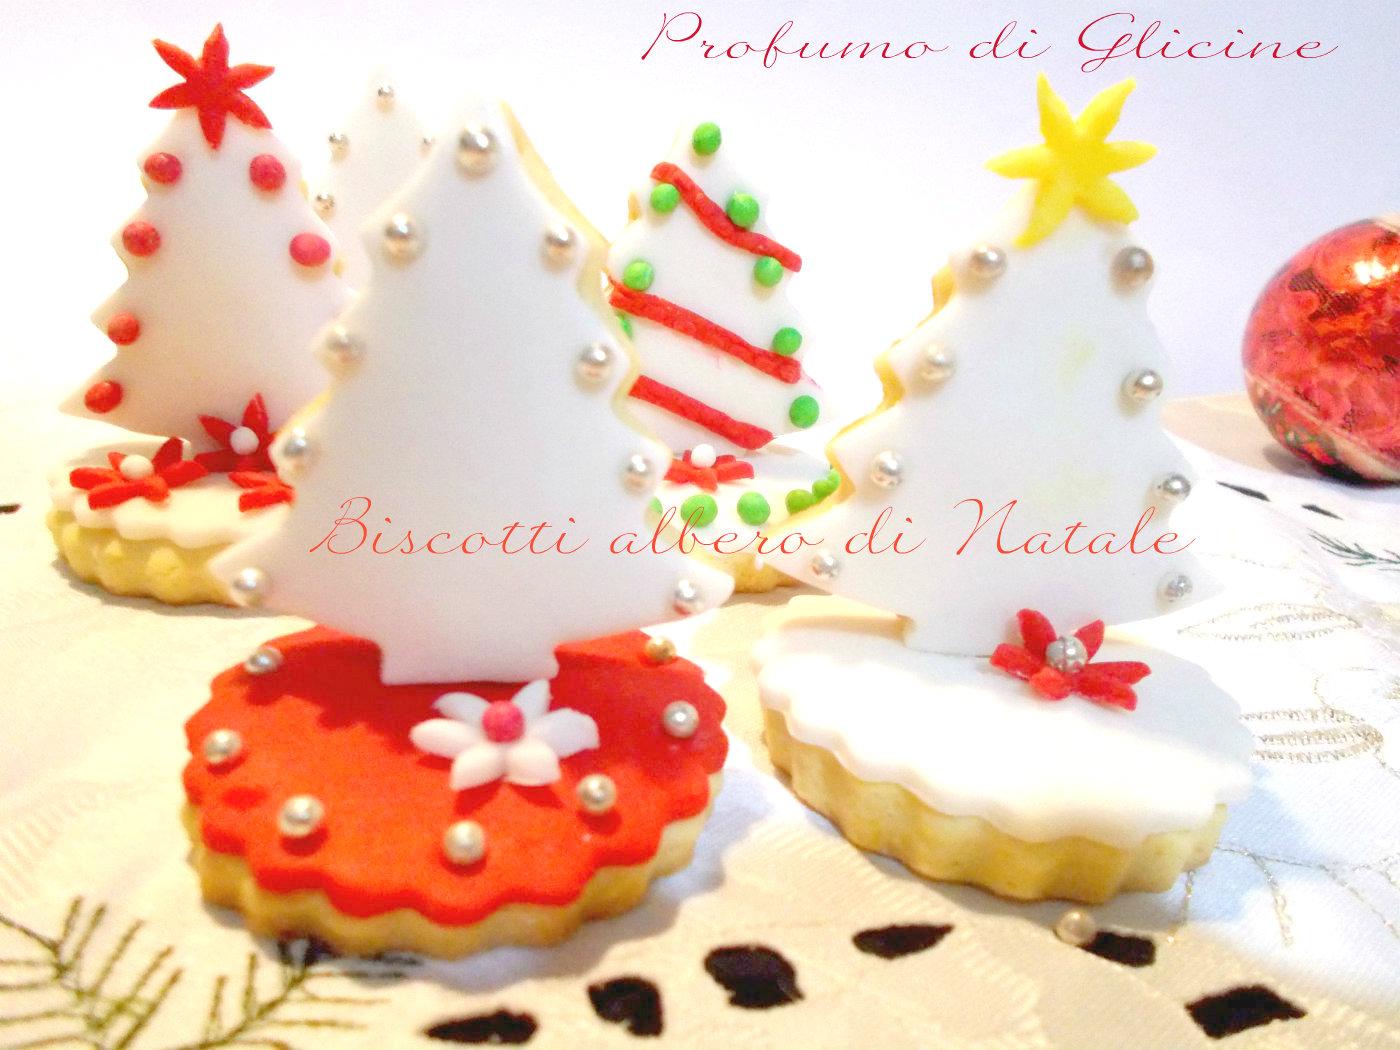 Biscotti Natale Pasta Di Zucchero.Biscotti Alberello Di Natale Decorati Con Pasta Di Zucchero